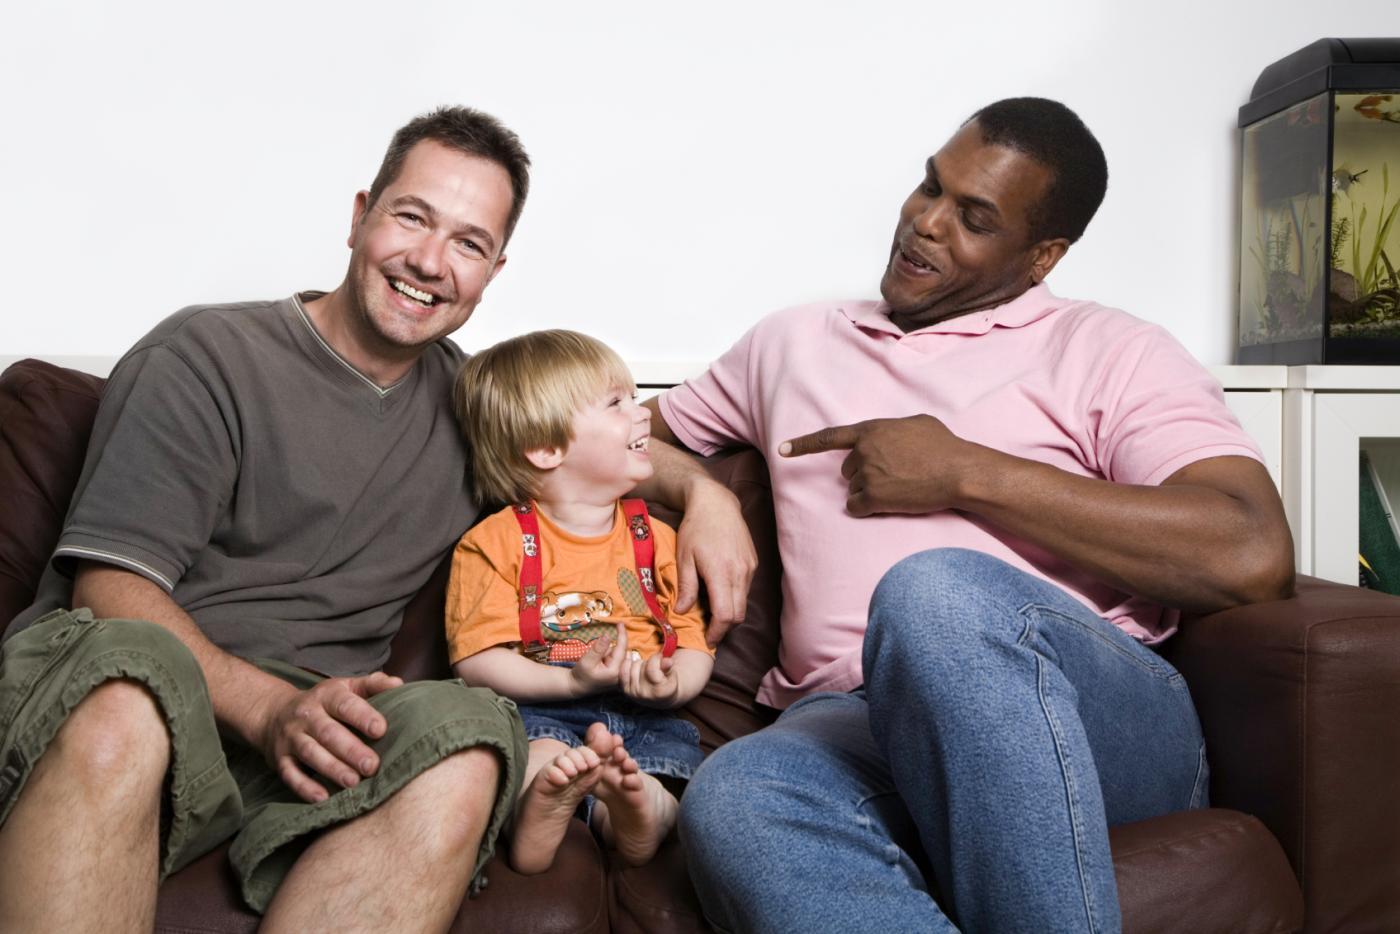 meis meis kalua äidiltä gay